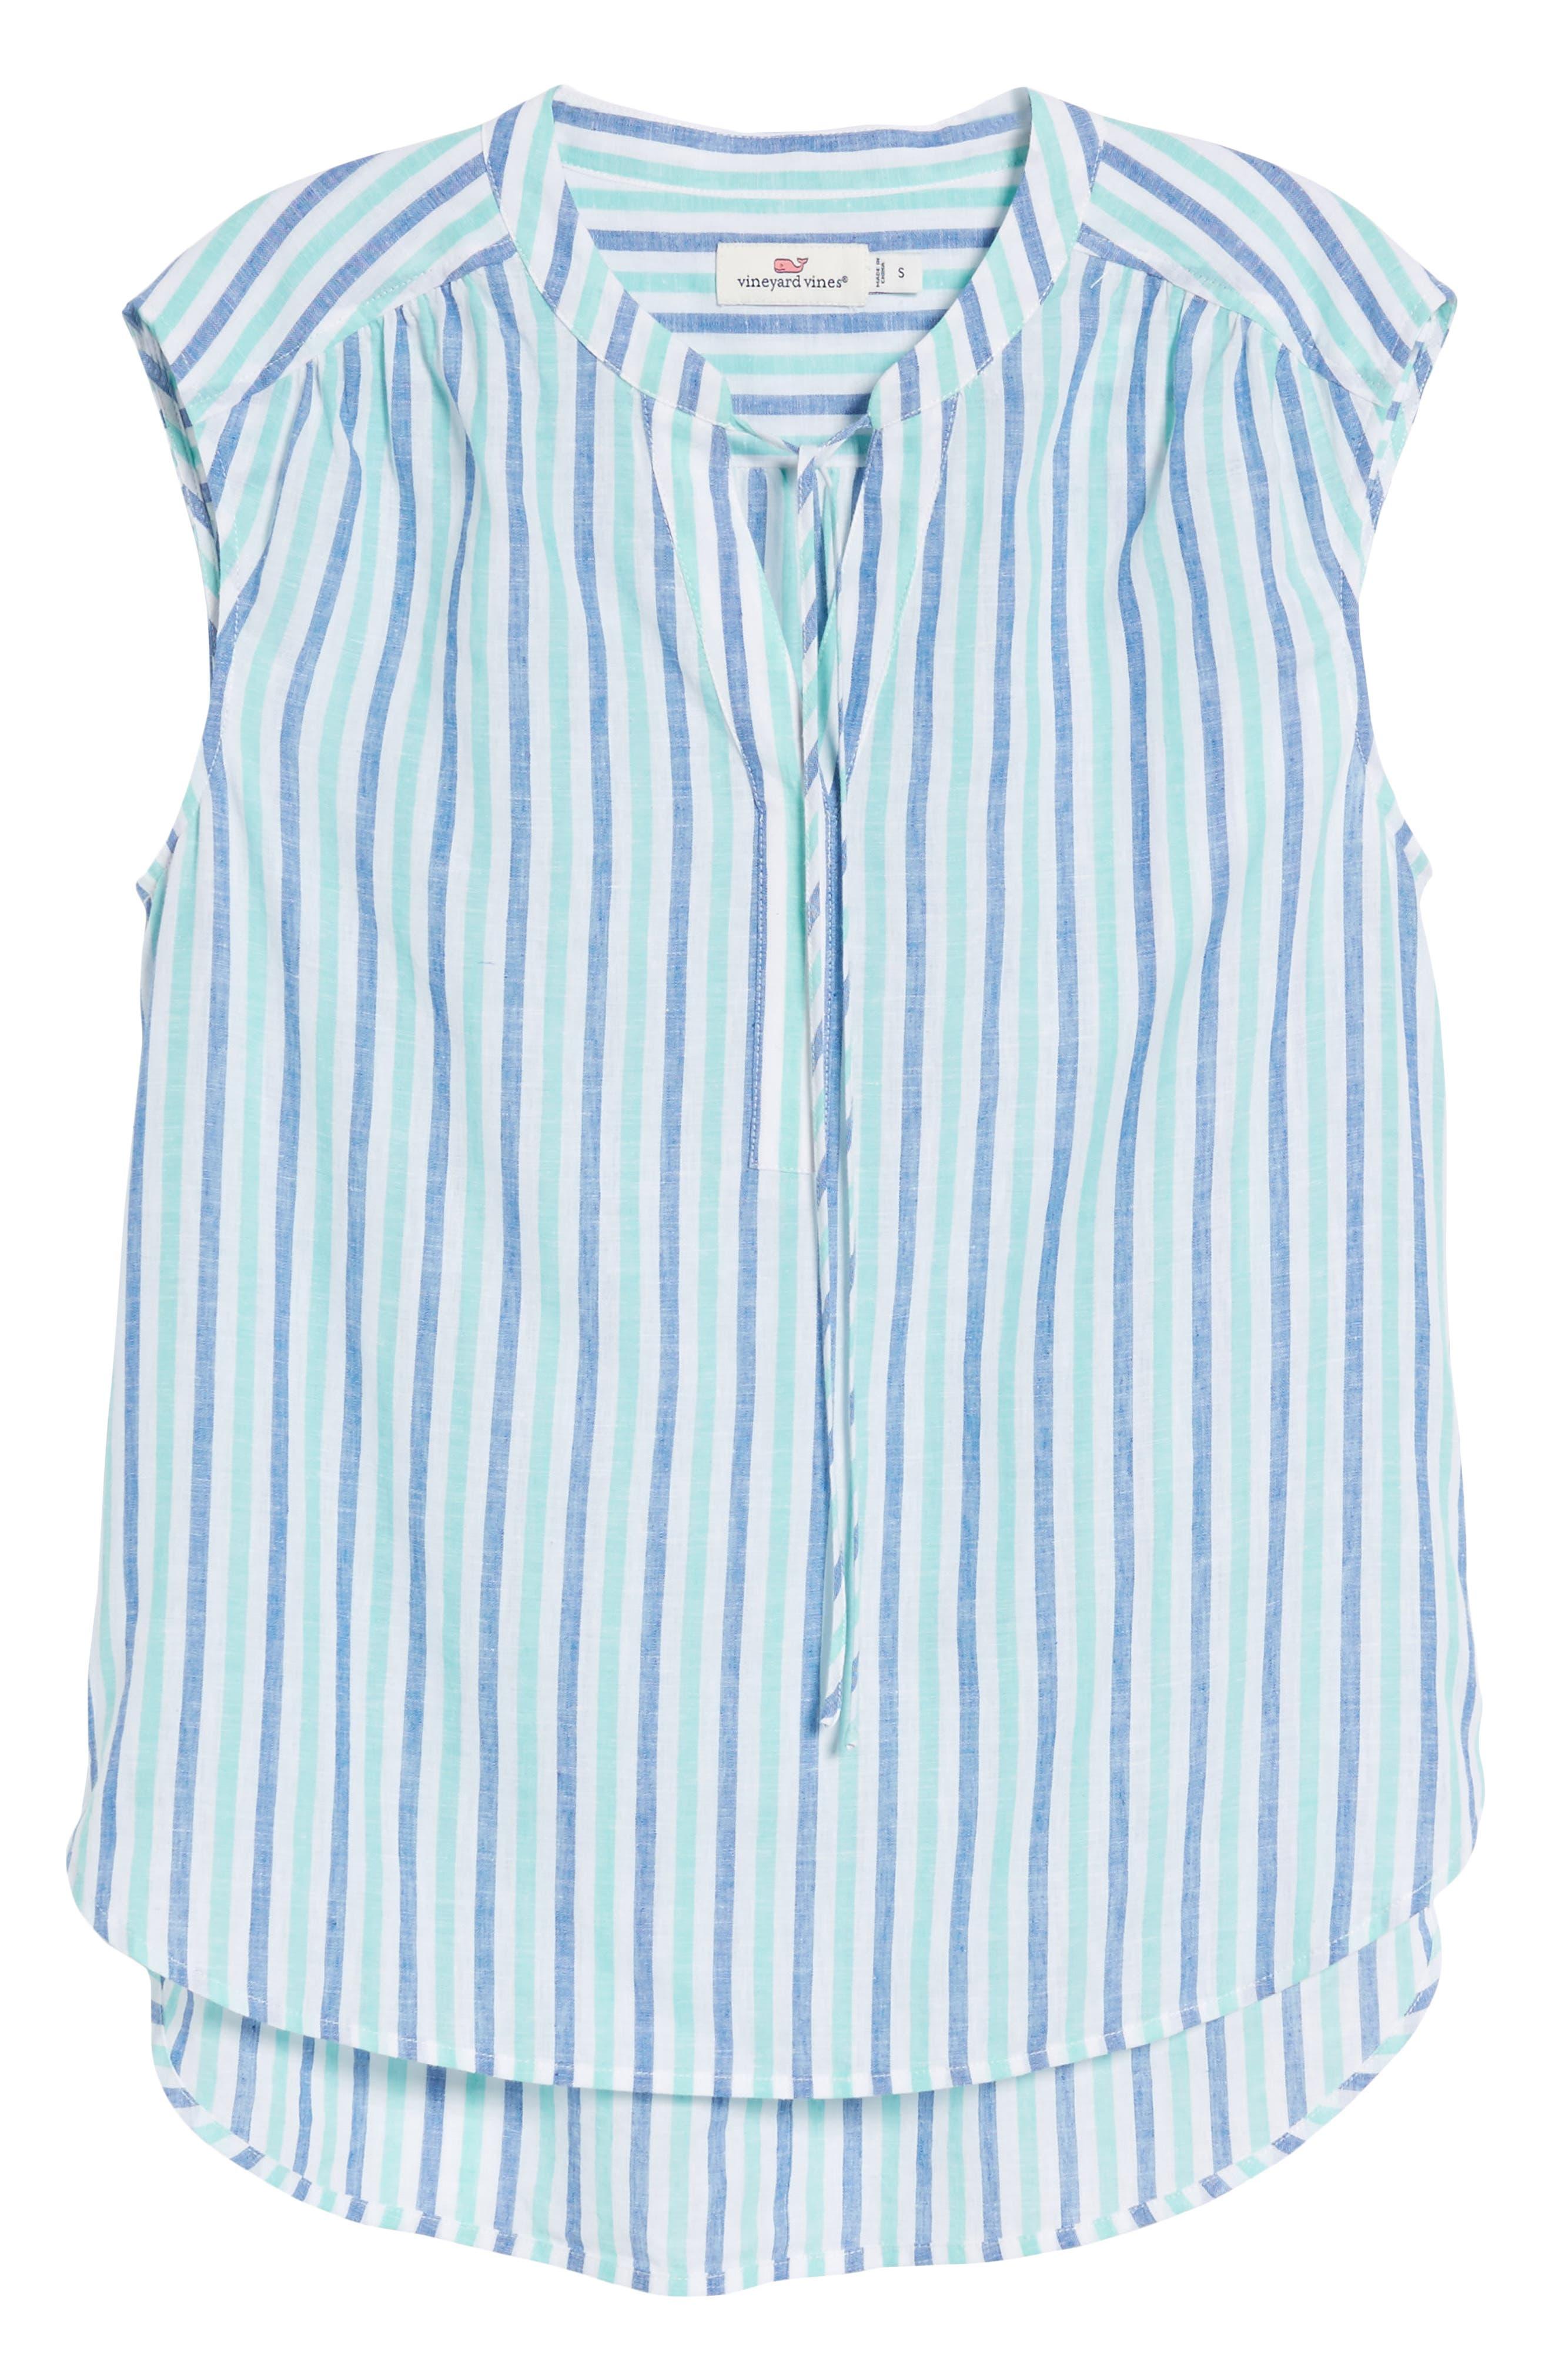 Hope Bay Linen Cotton Stripe Top,                             Alternate thumbnail 7, color,                             Capri Blue